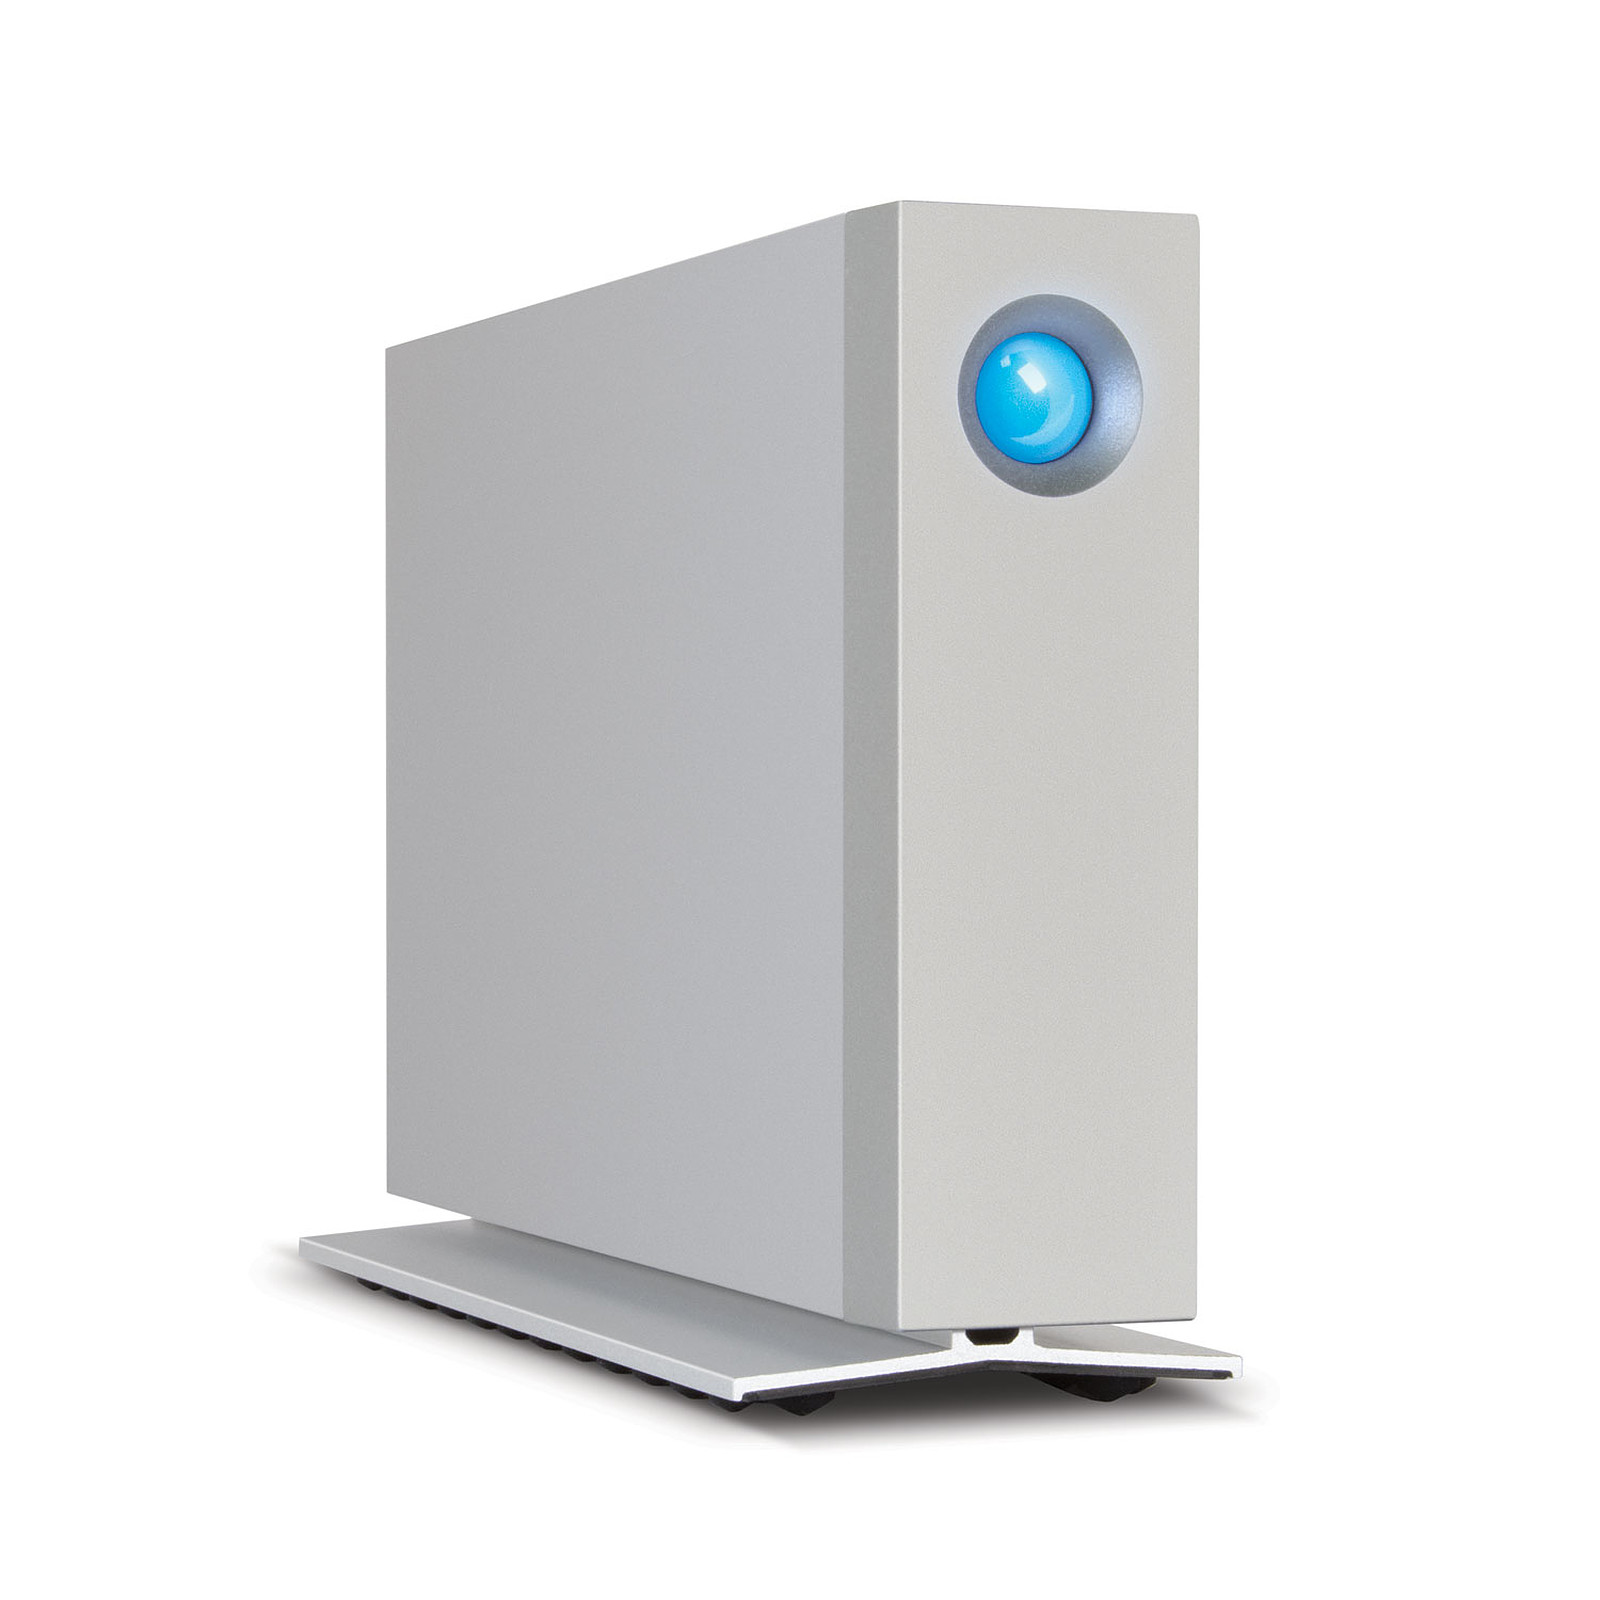 LaCie d2 USB 3.0 (5 To)